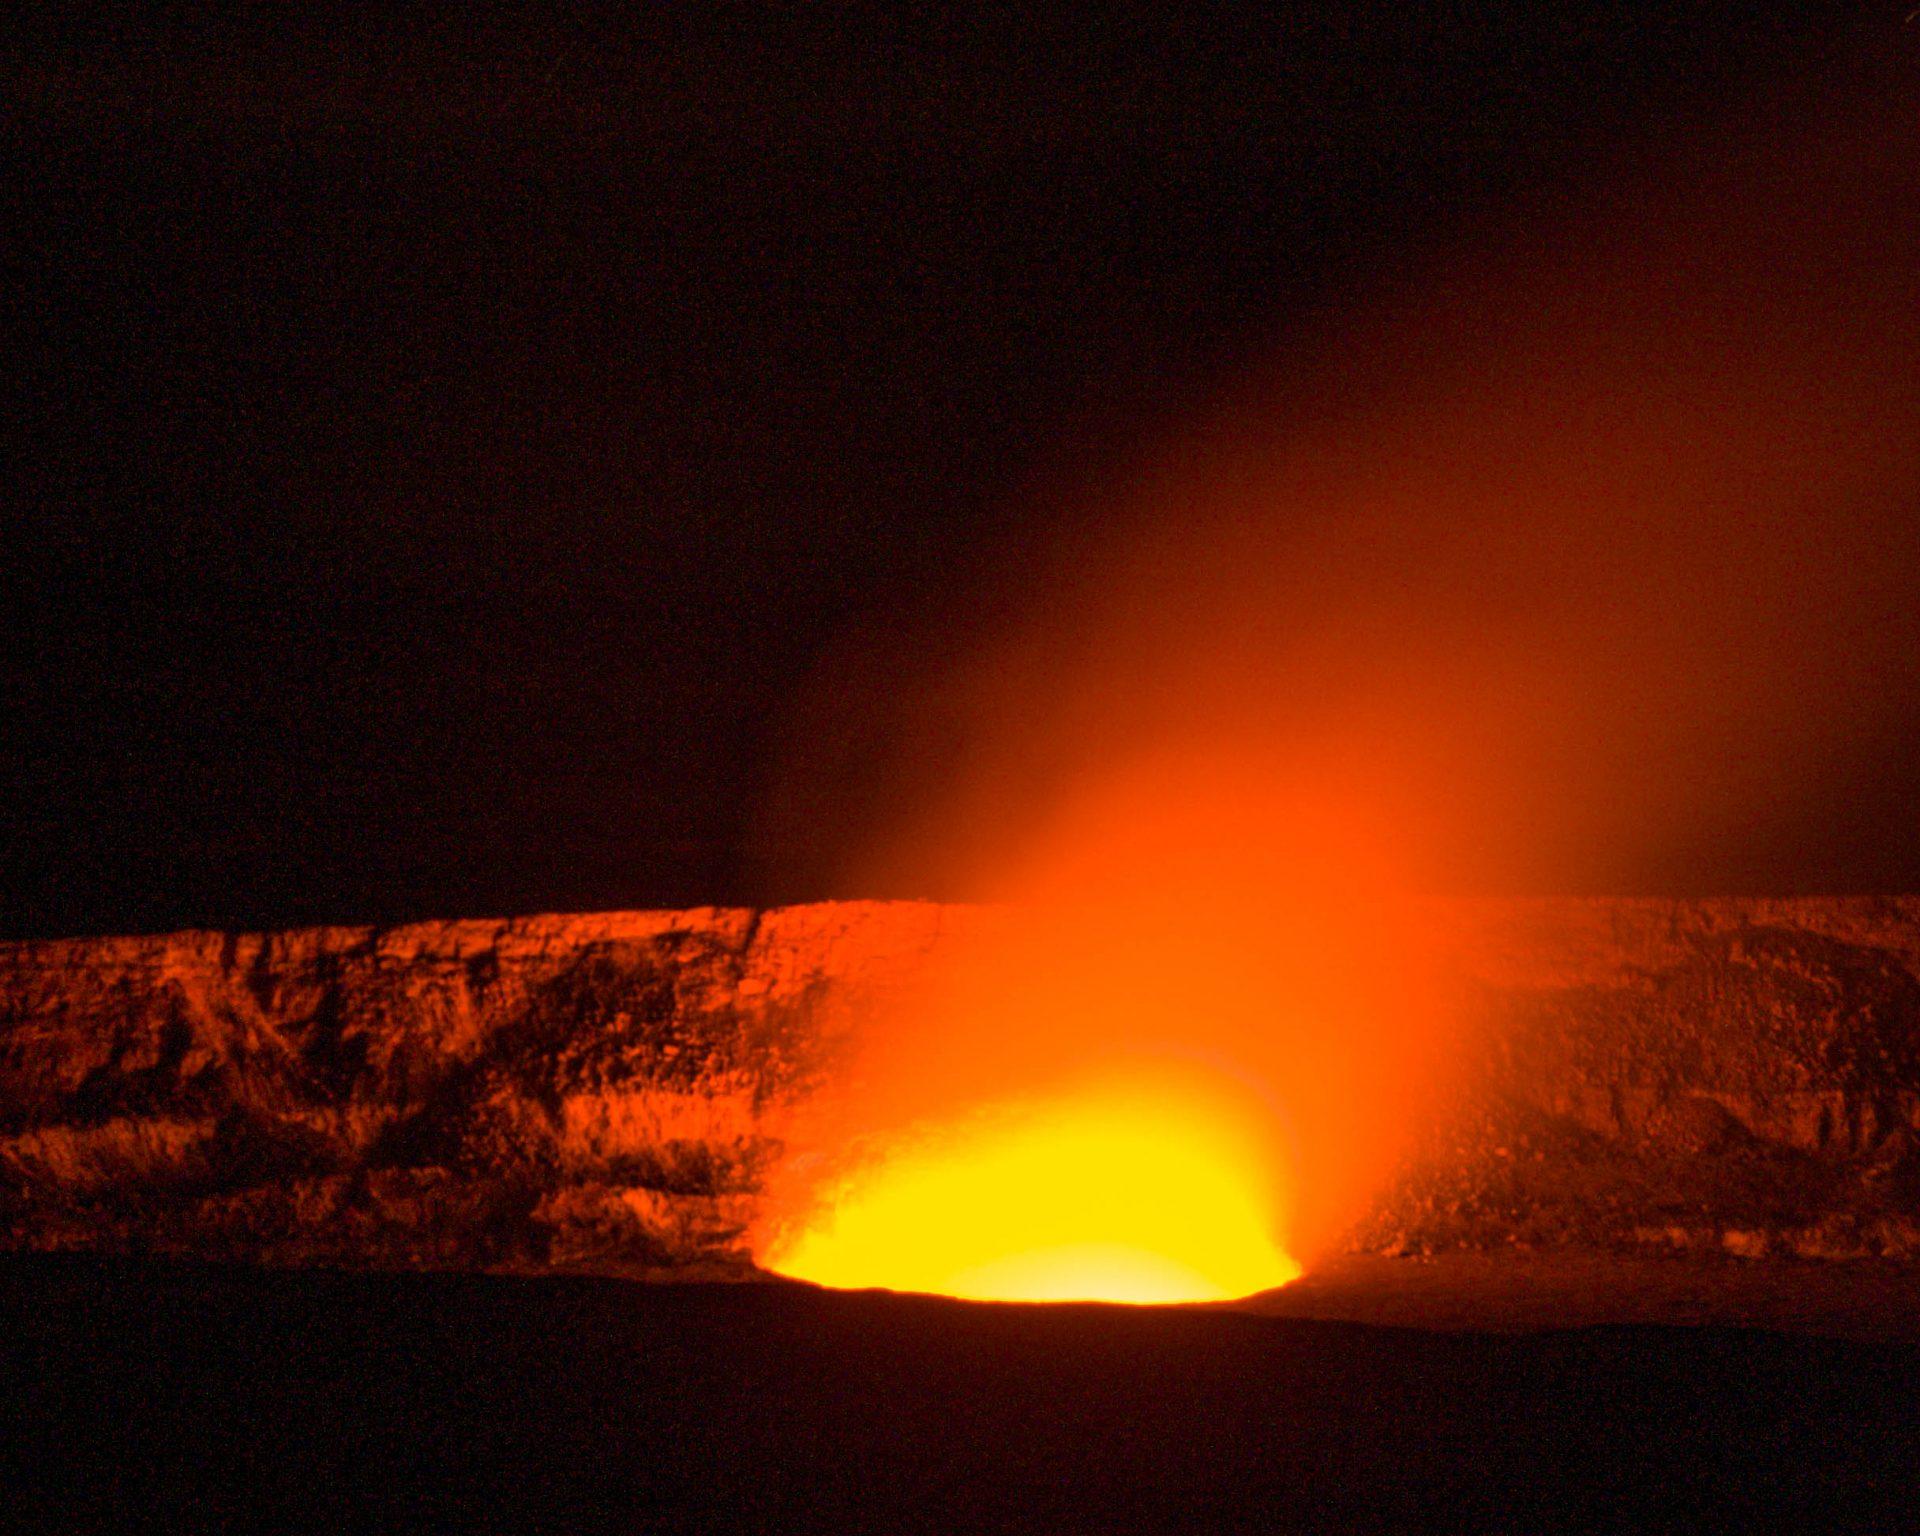 The Halema'uma'u crater is glowing at Hawaii Volcanoes National Park.